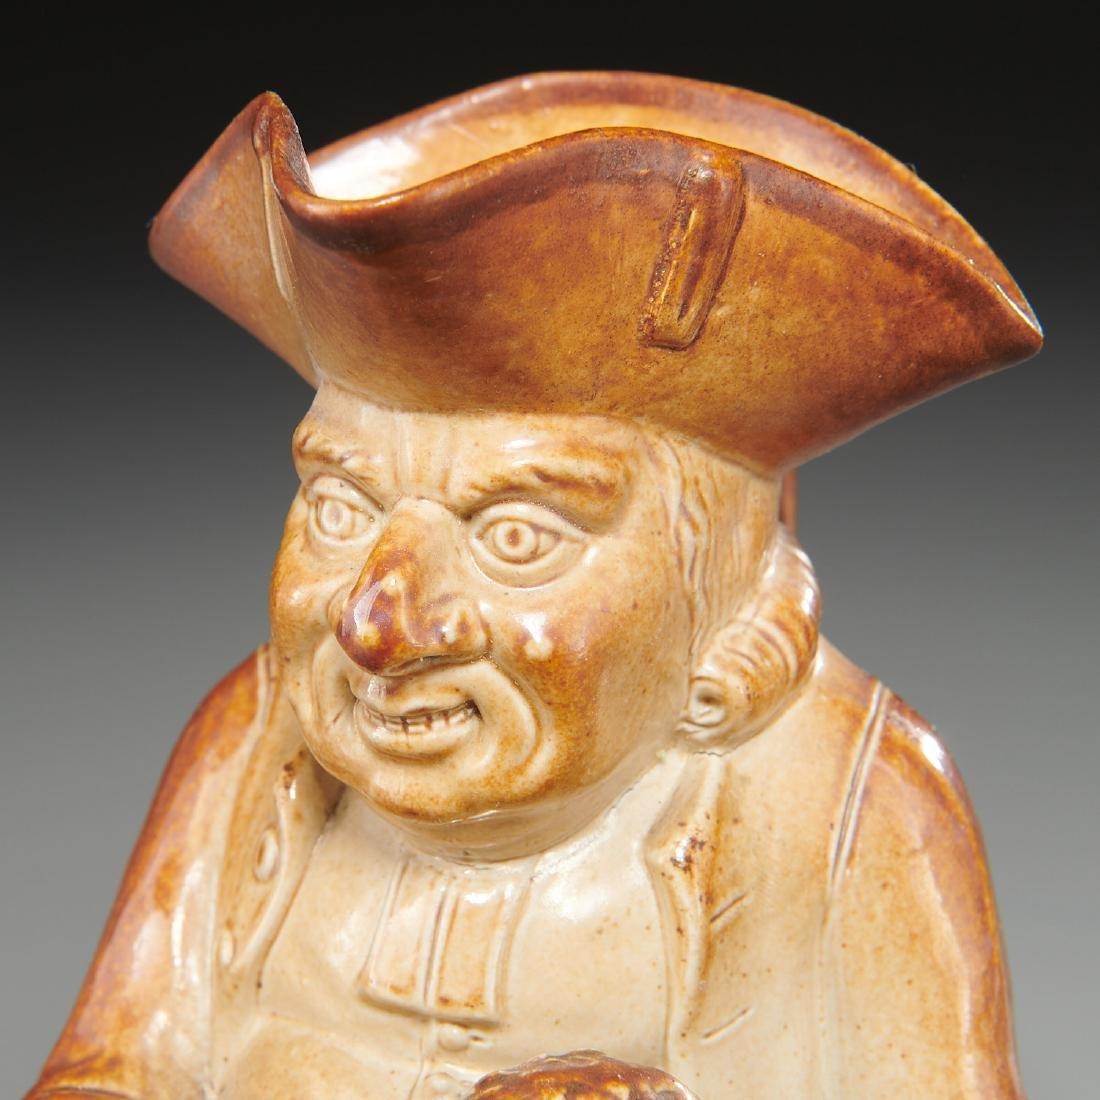 English stoneware Toby jug, c. 1800's - 2